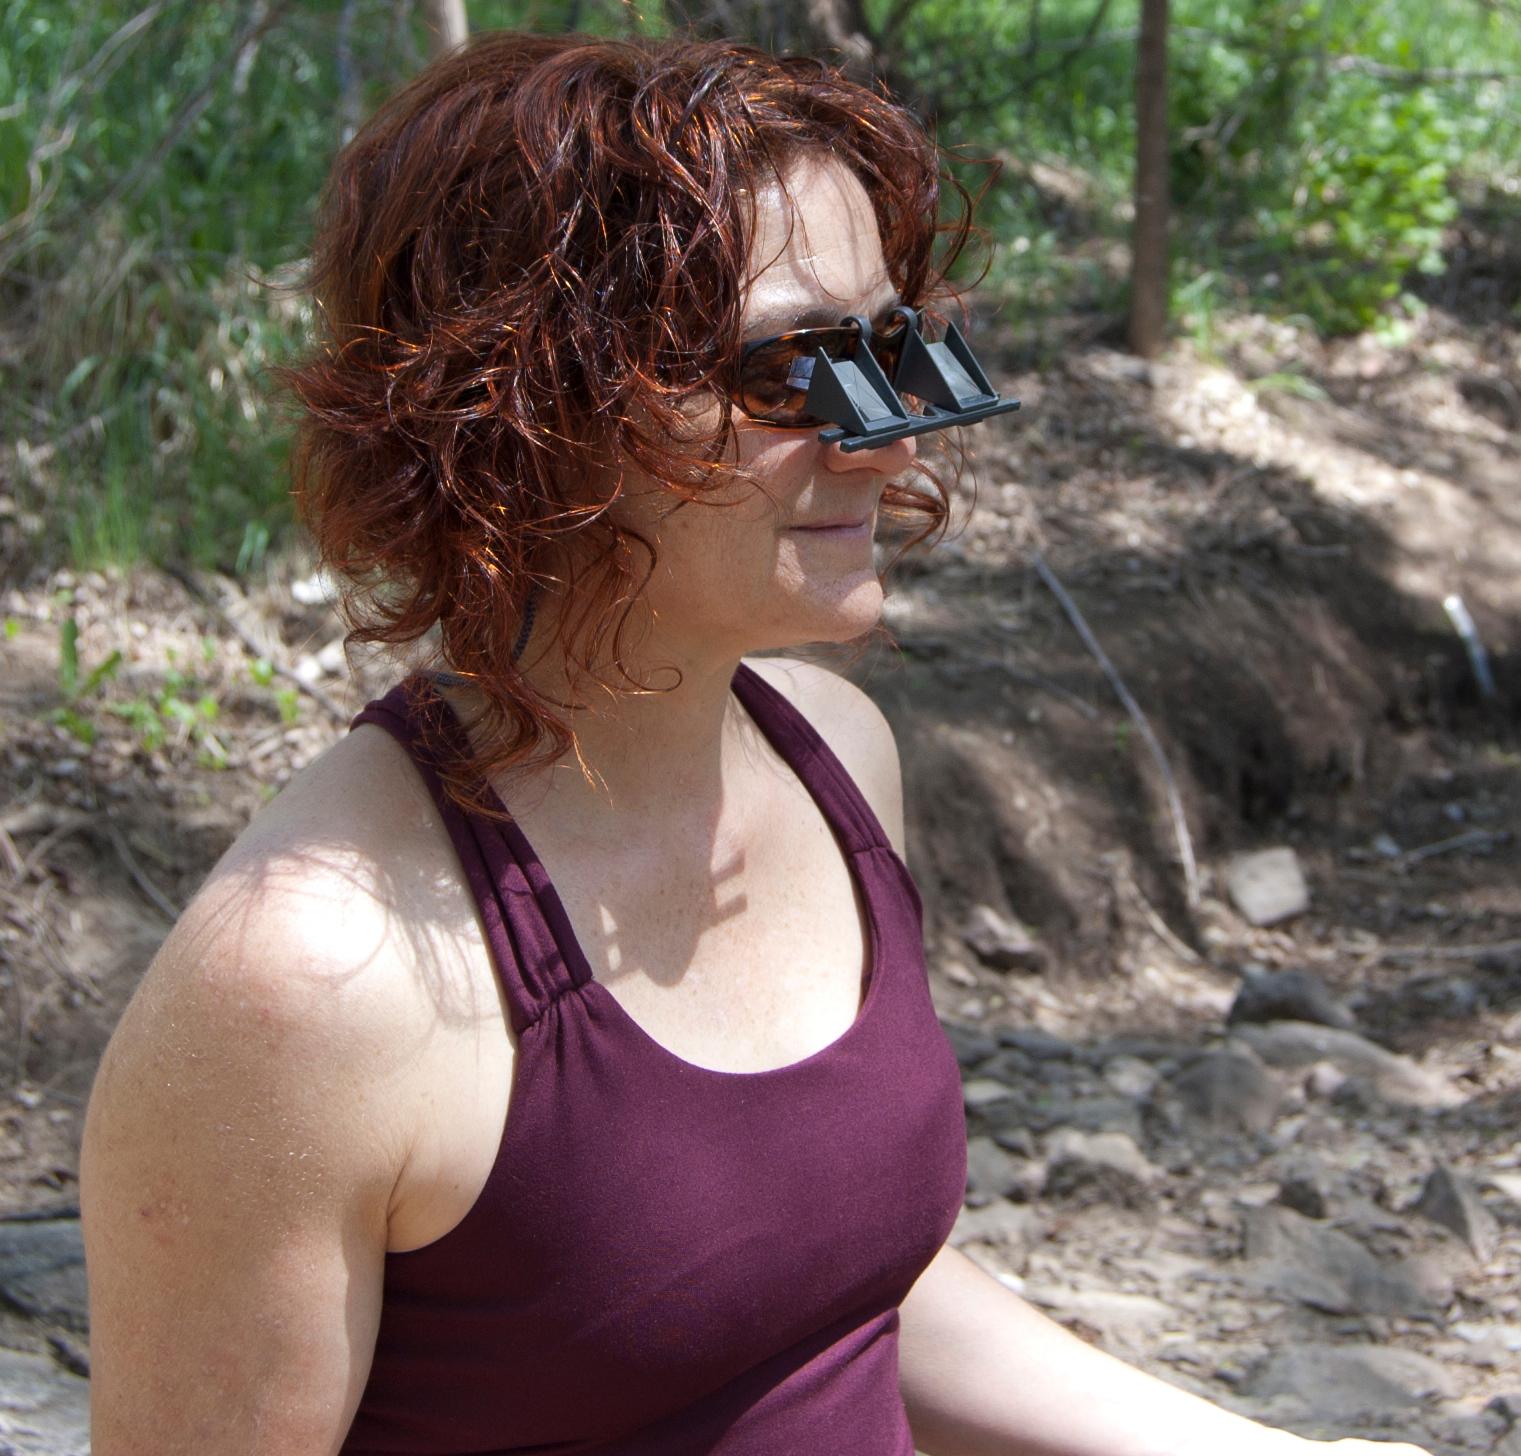 Mary Iannotti wearing Belay Glasses by Belay Optics